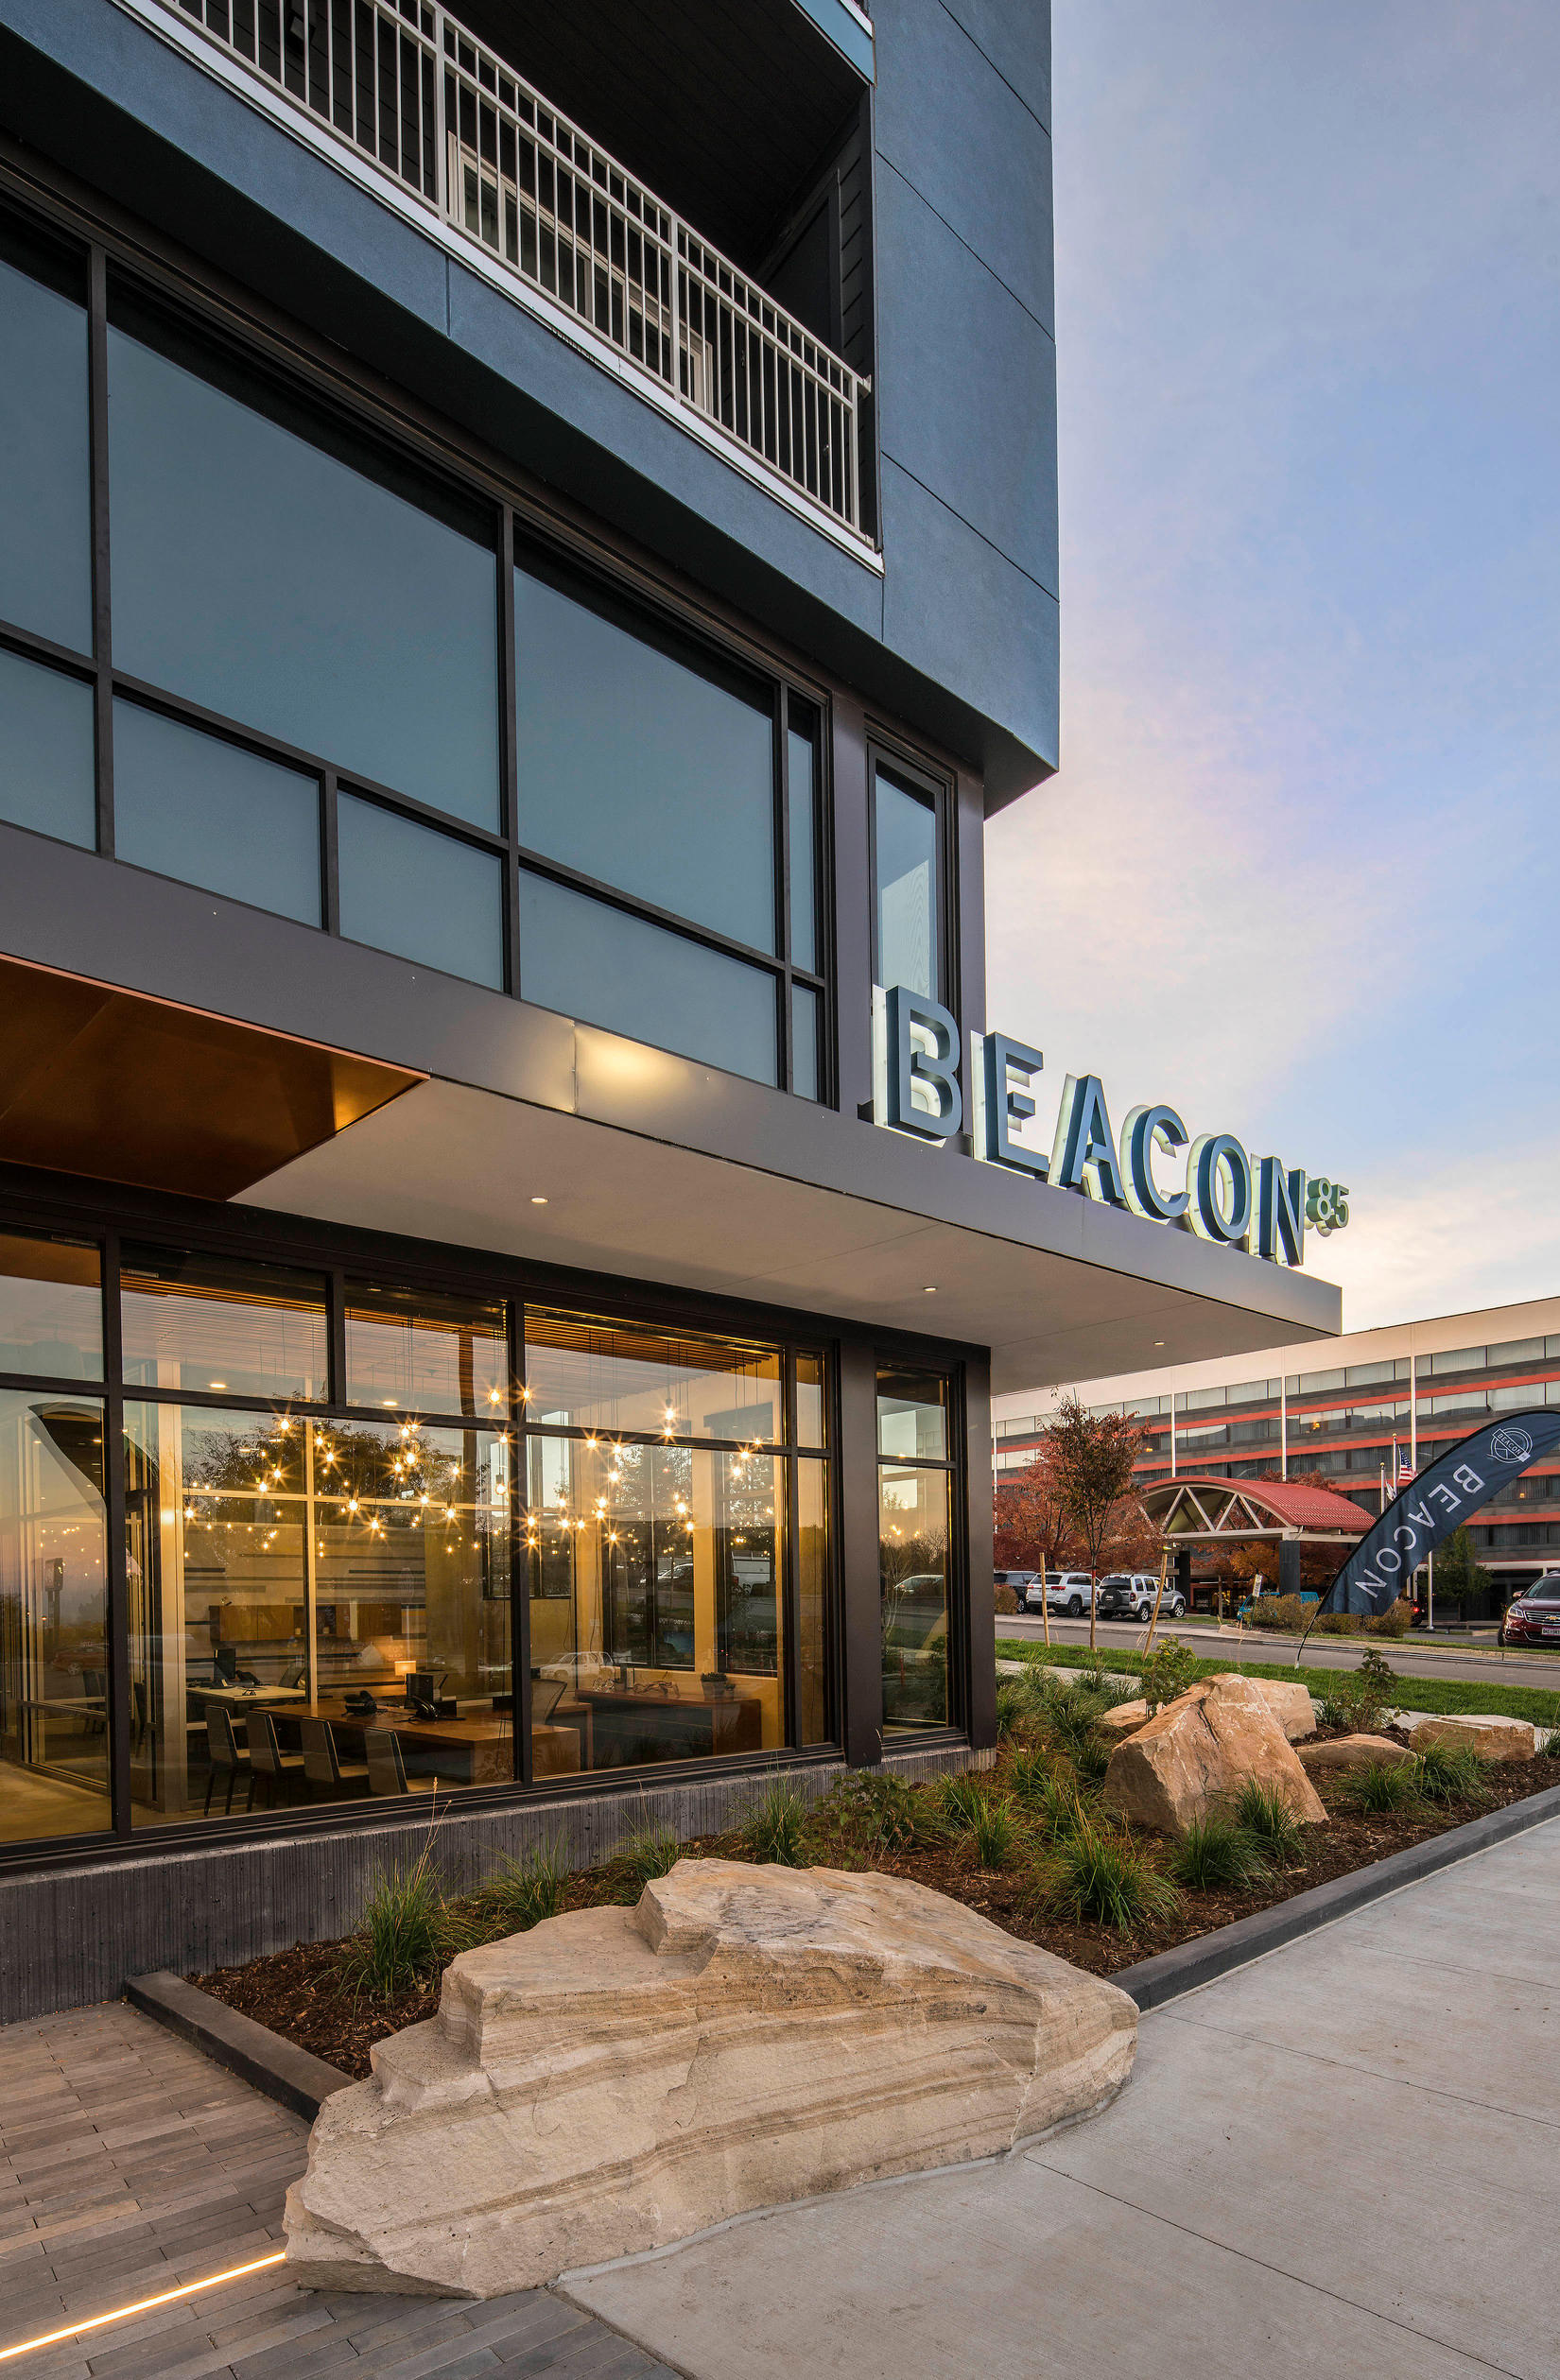 Beacon85 Apartments image 1